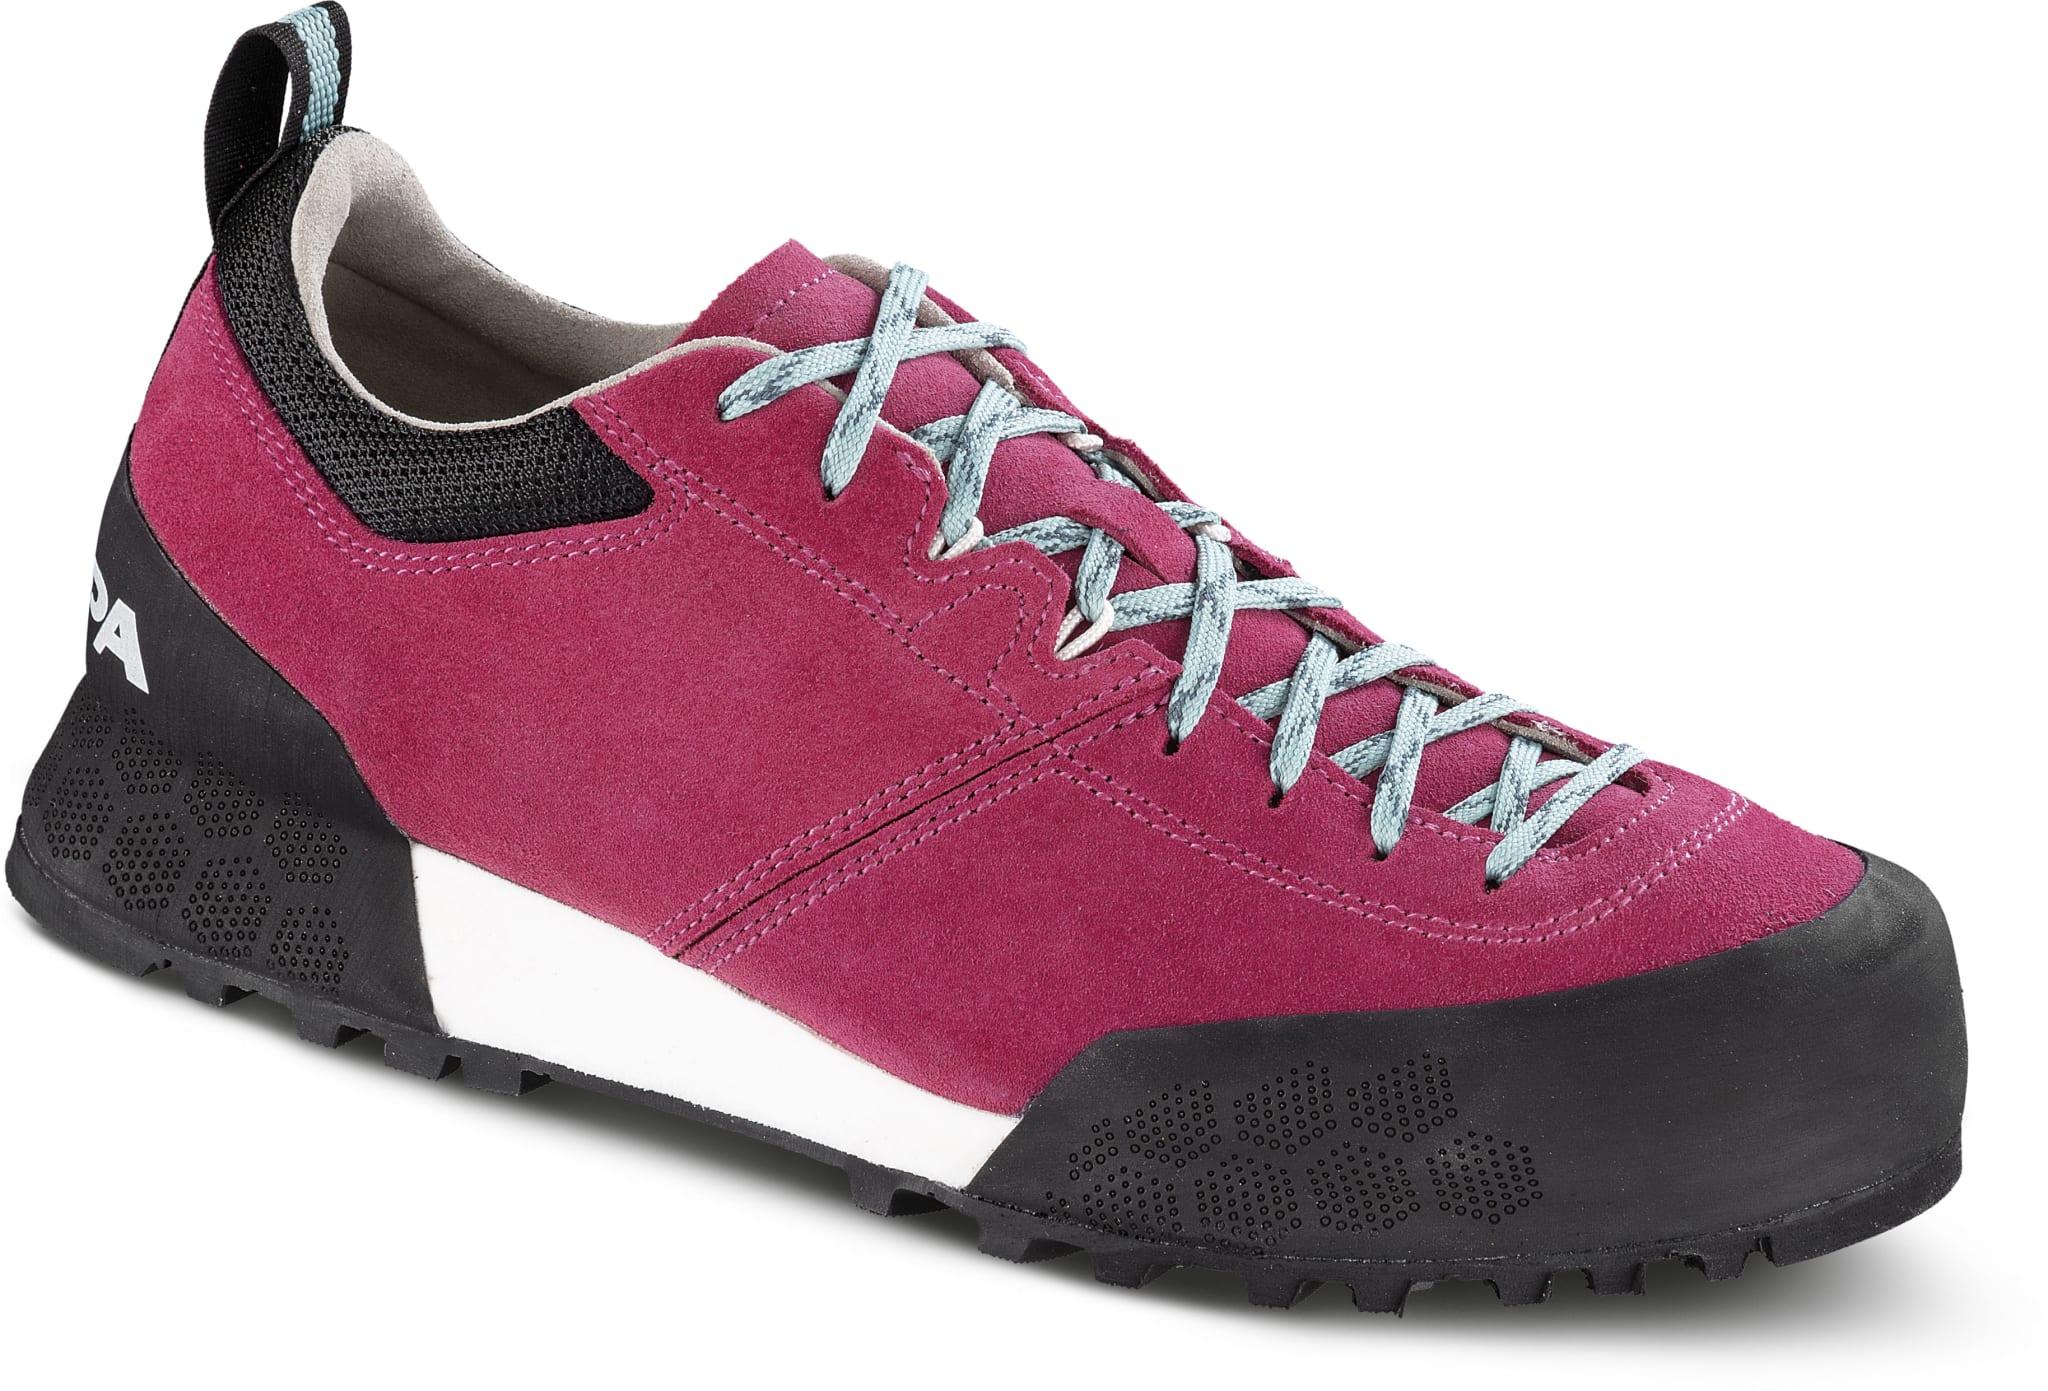 Komfortabel sko for lange anmarsjer i steinete terreng